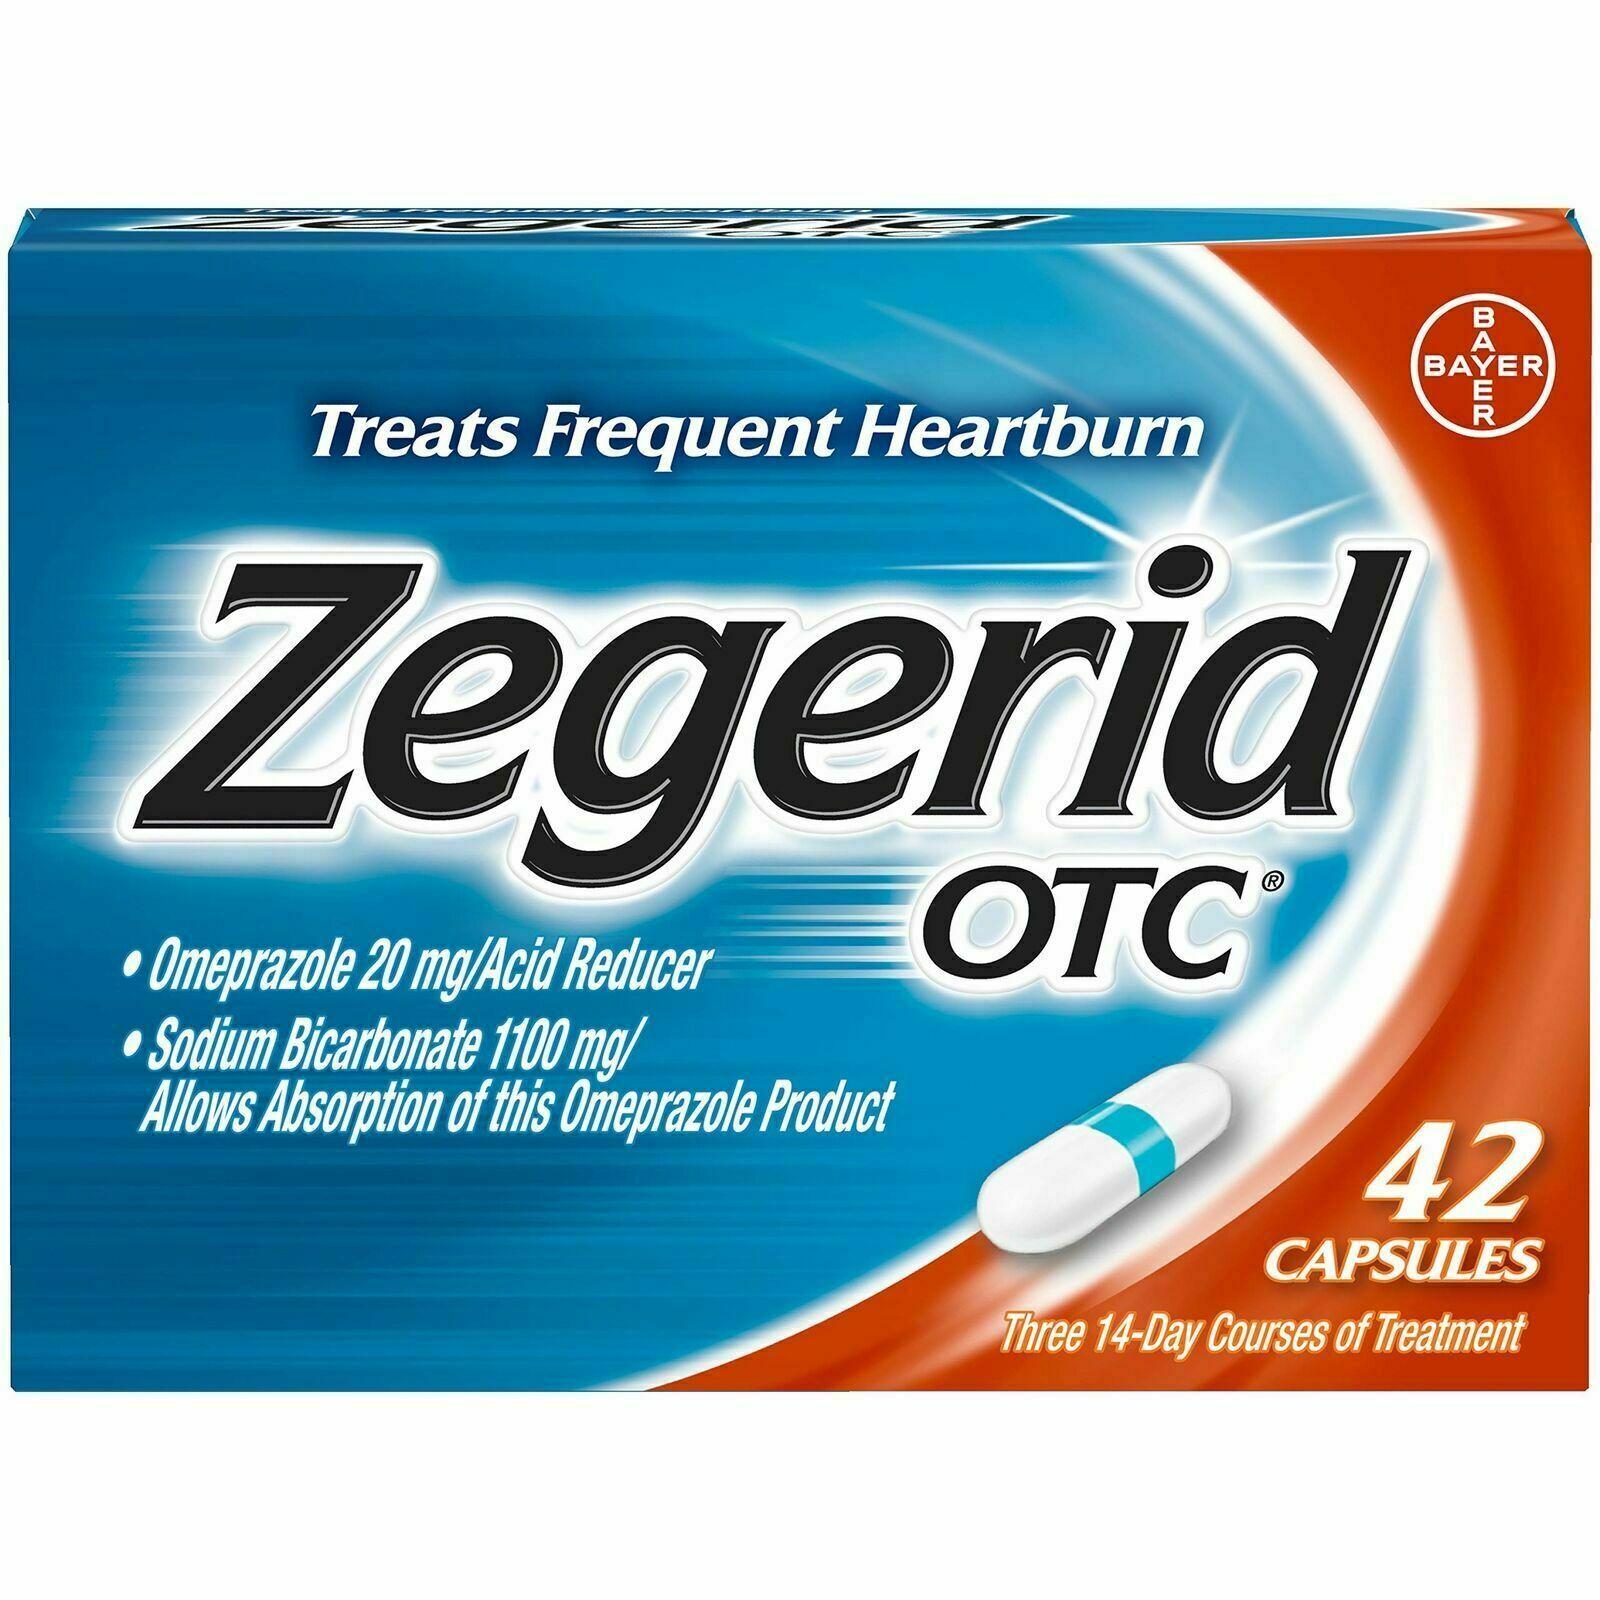 Zegerid OTC Heartburn Relief 24 Hour Stomach Acid Reducer Proton Pump 42 Capsule 1